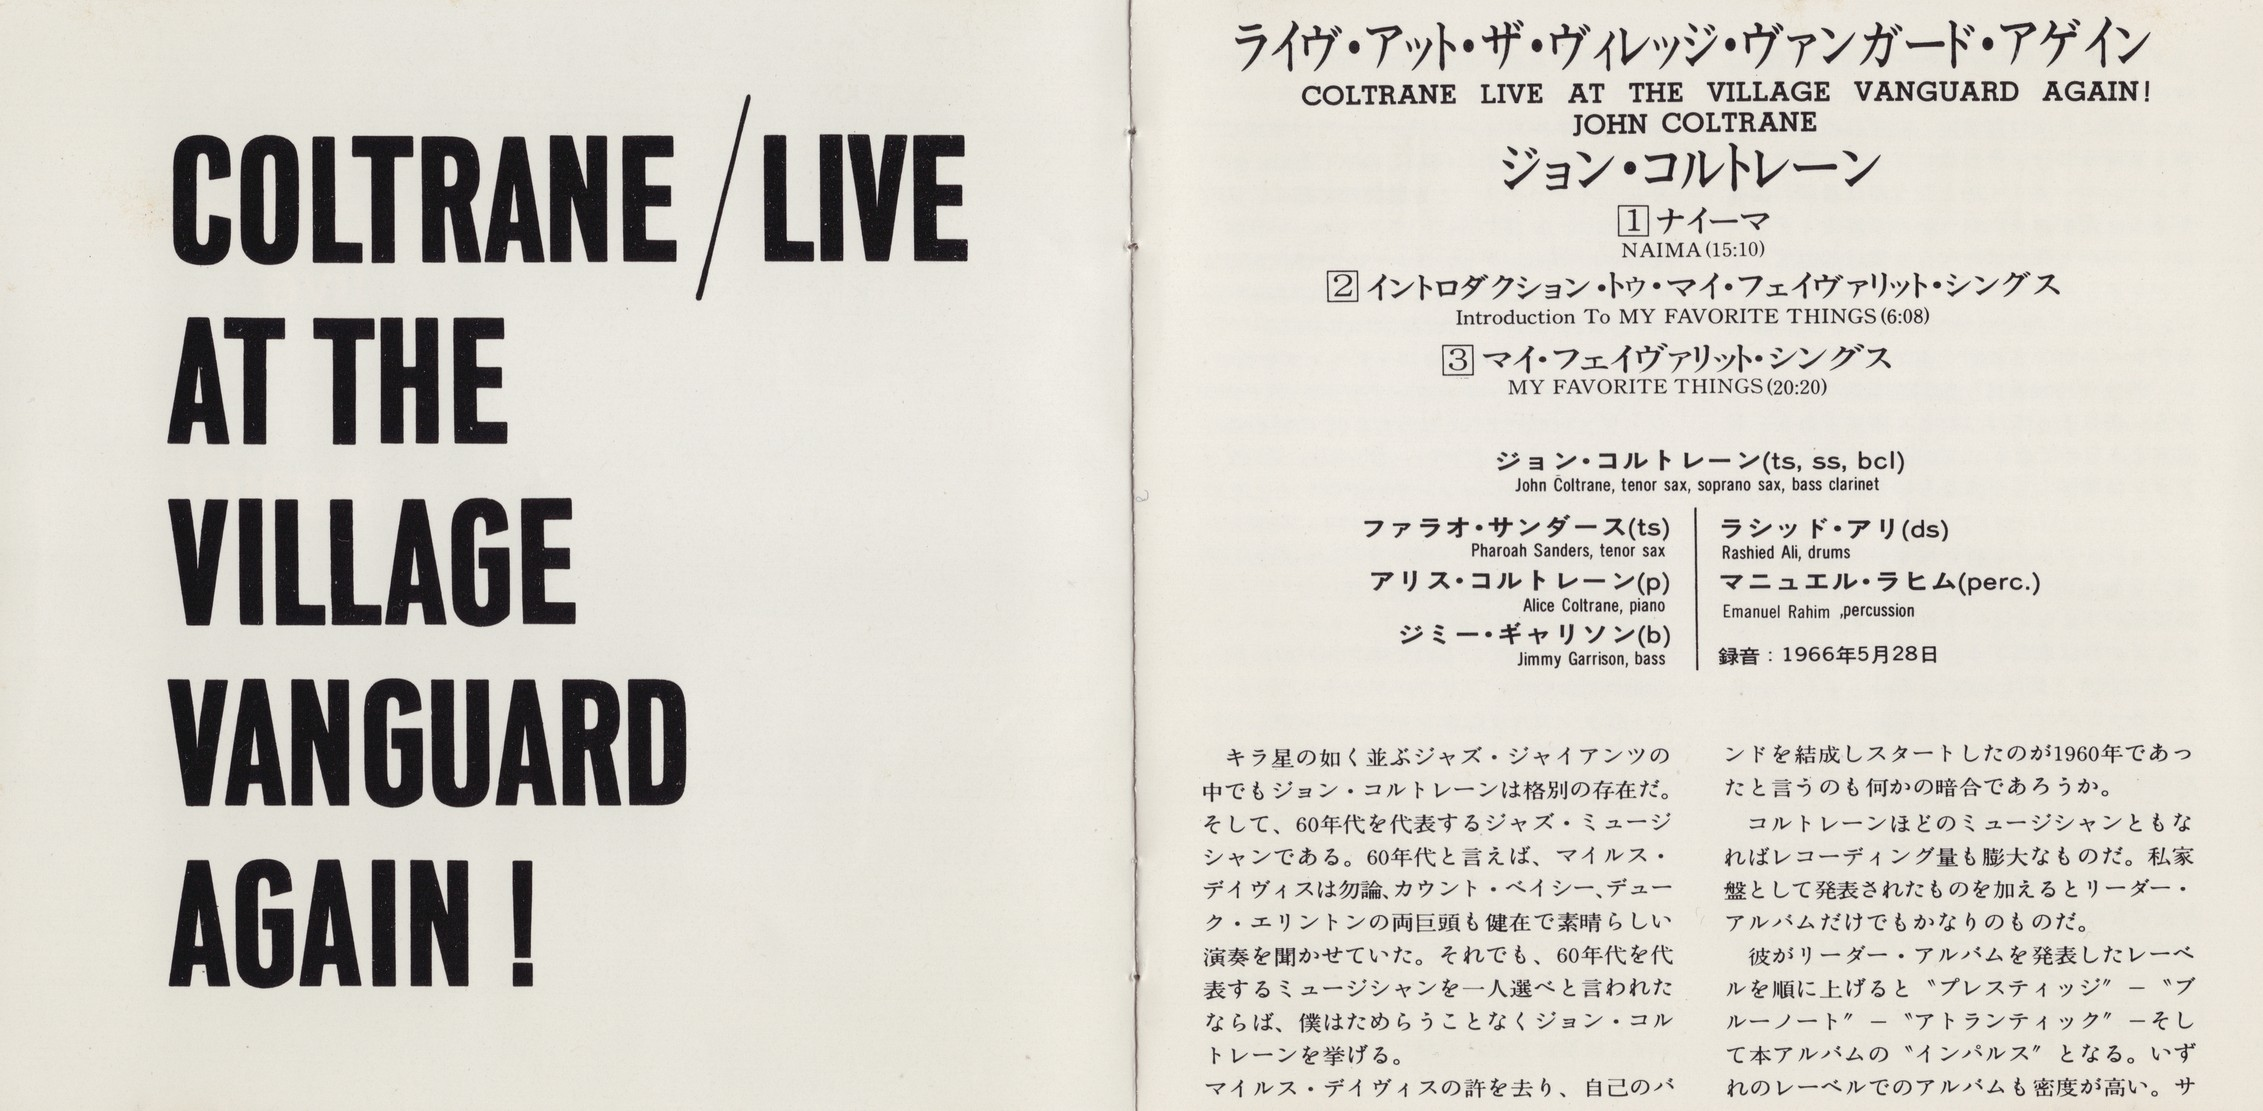 John Coltrane - Live at The Village Vanguard Again! (1966